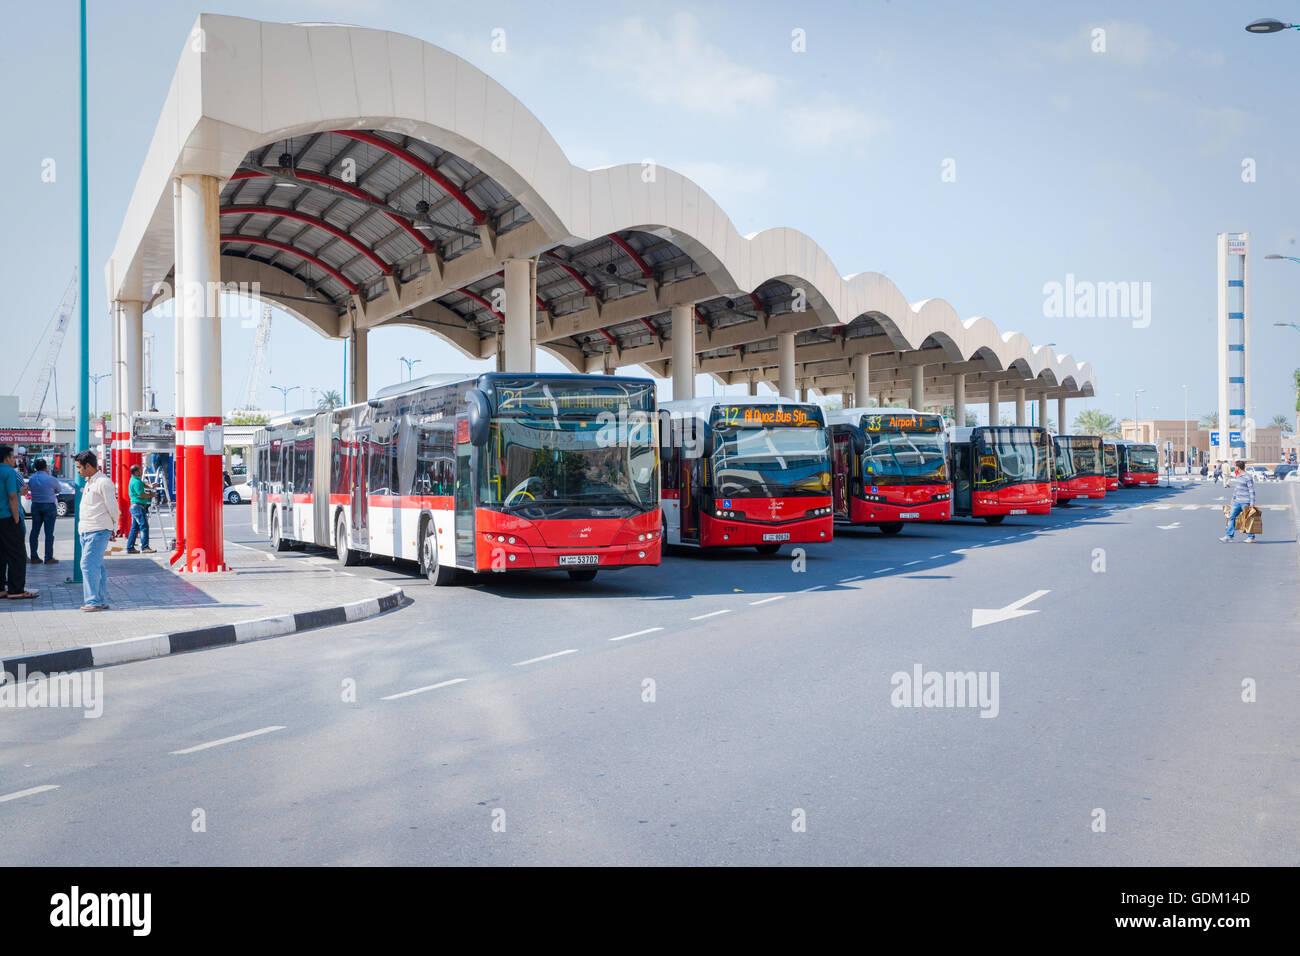 Al Ghubaiba Bus Stand Dubai Uae Stock Photo 111692685 Alamy